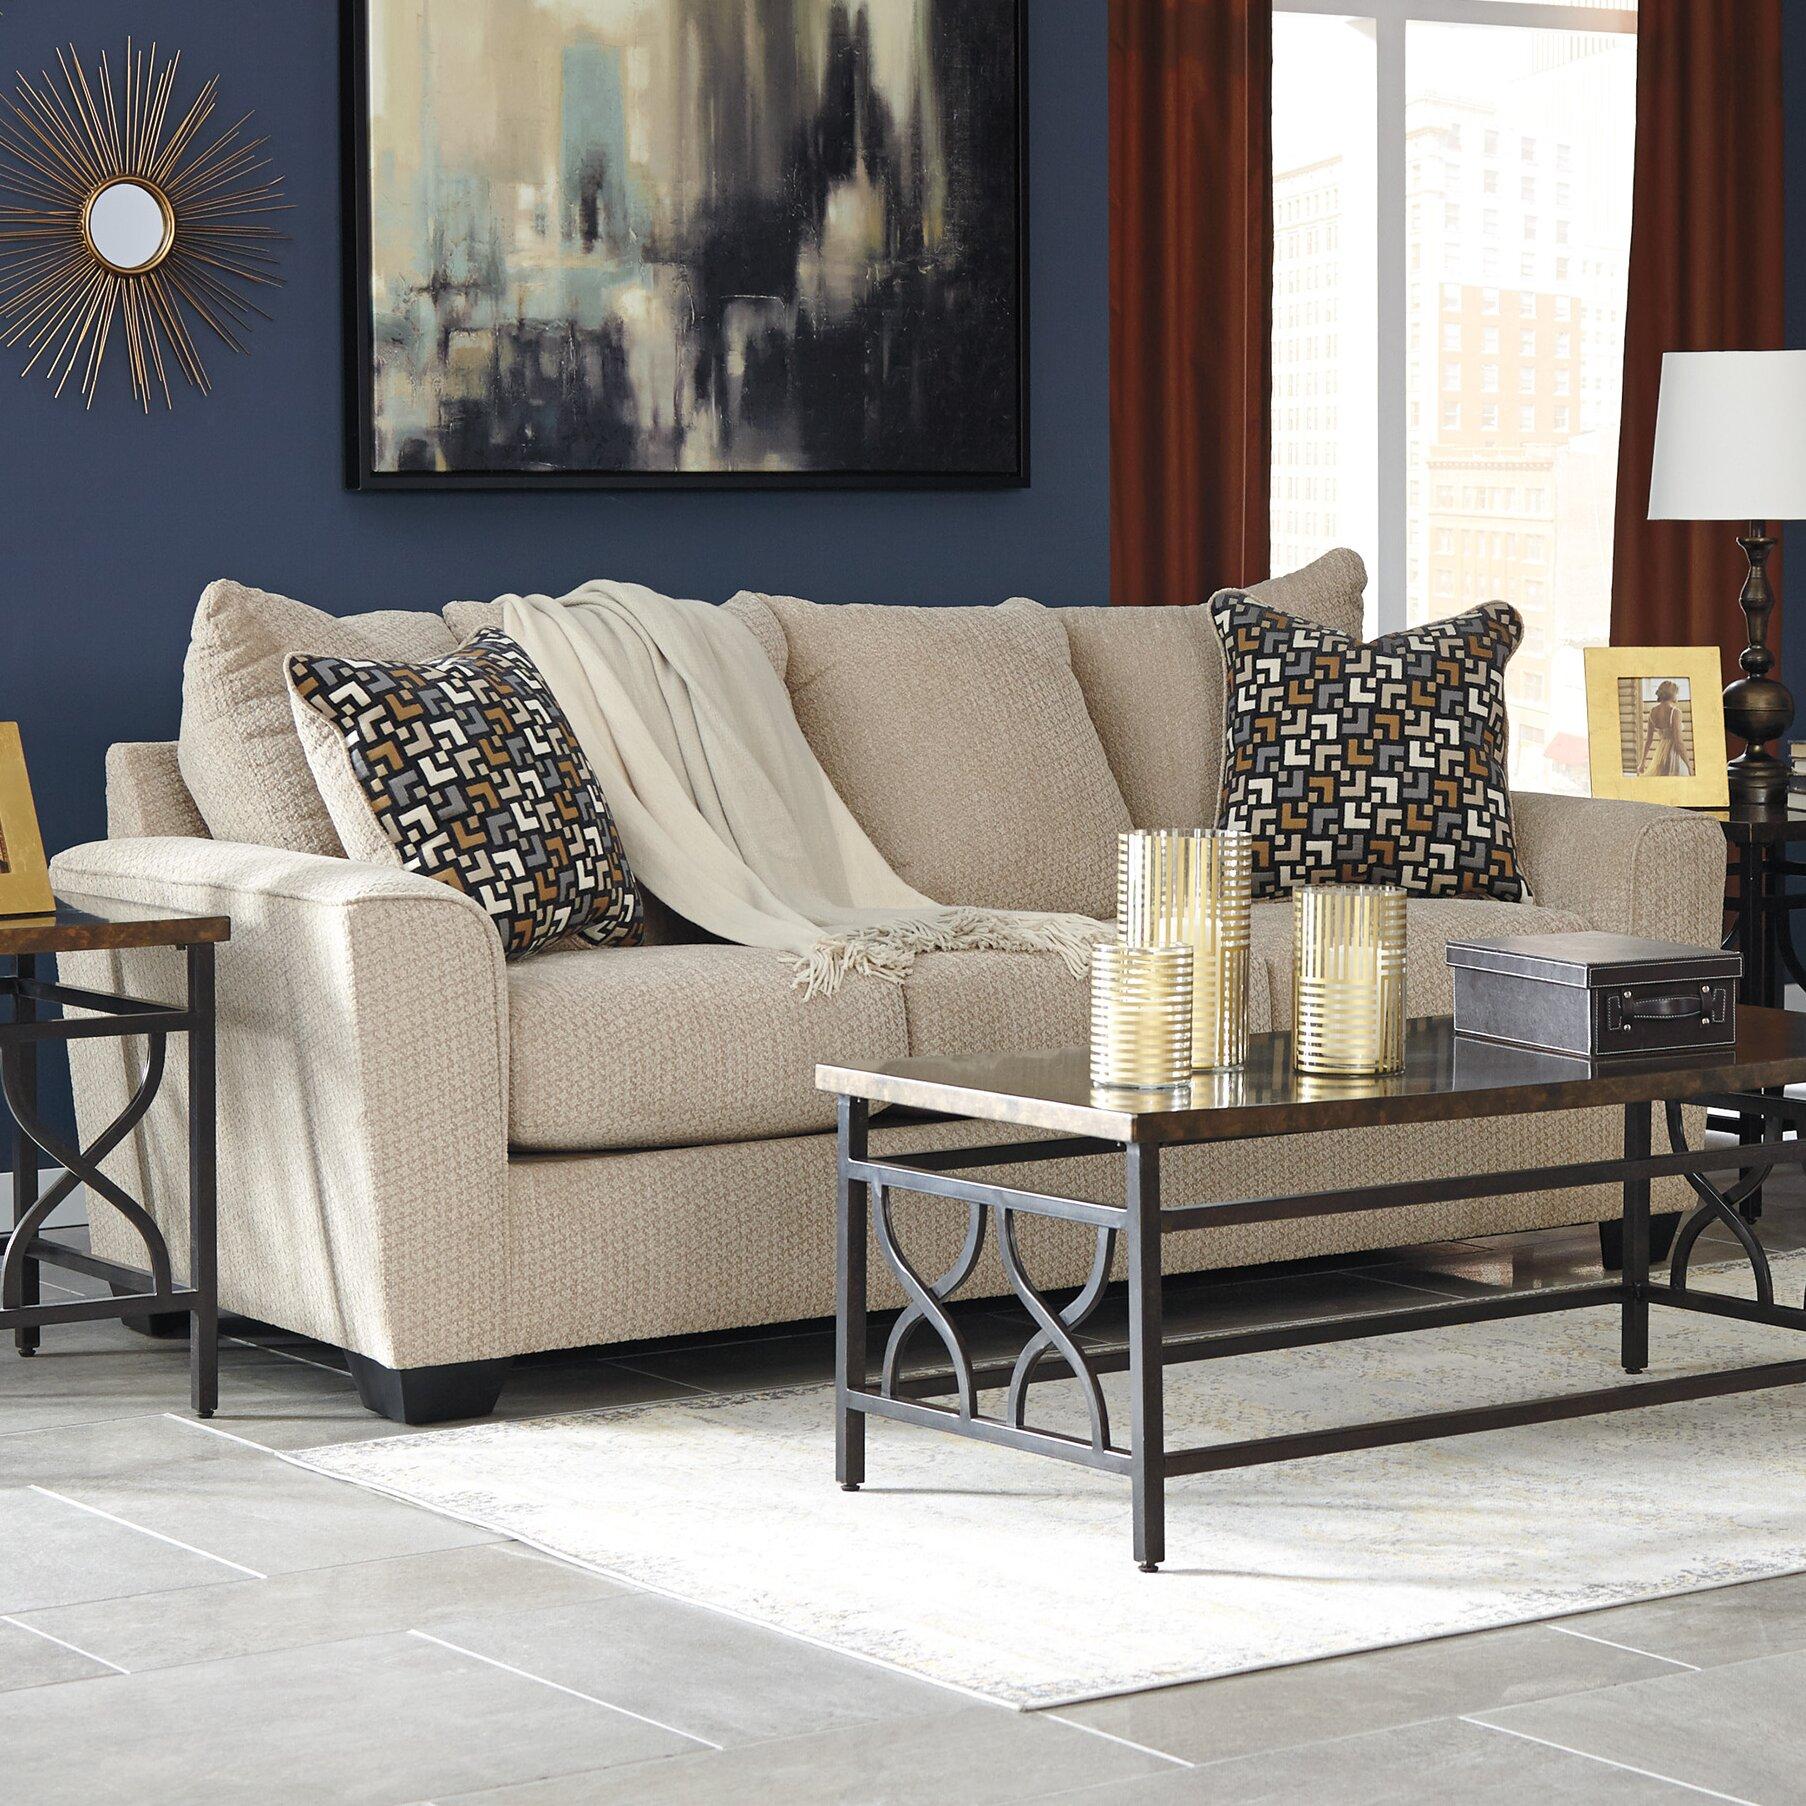 Benchcraft Wixon Sleeper Sofa Reviews